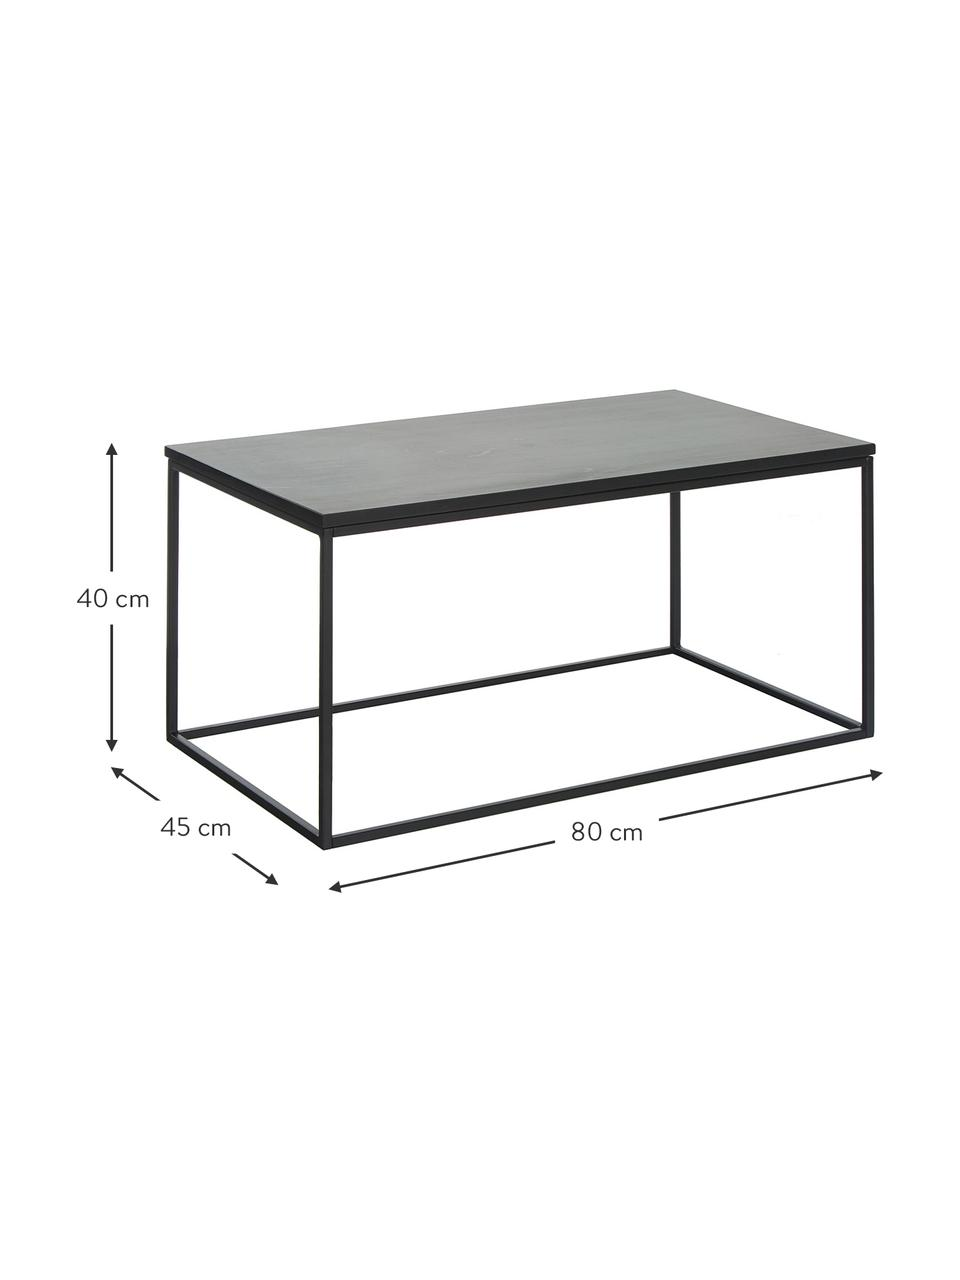 Marmeren salontafel Alys, Tafelblad: marmer, Frame: gepoedercoat metaal, Tafelblad: zwart marmer, licht glanzend. Frame: mat zwart, 80 x 40 cm